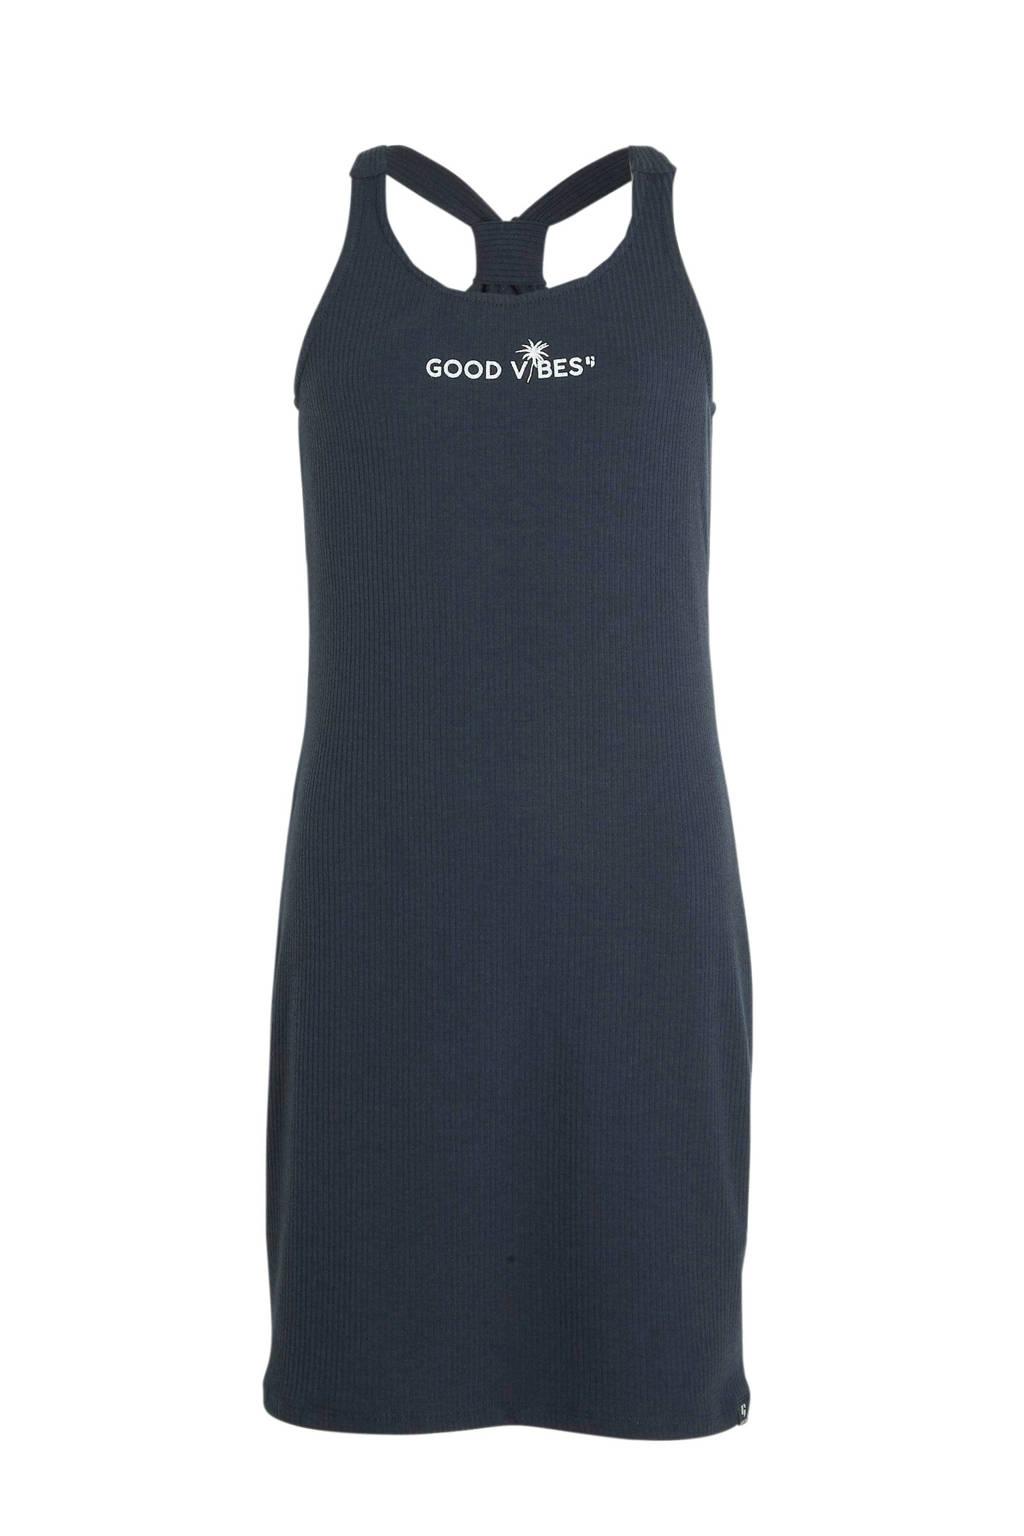 Garcia jersey jurk met tekst donkerblauw, Donkerblauw